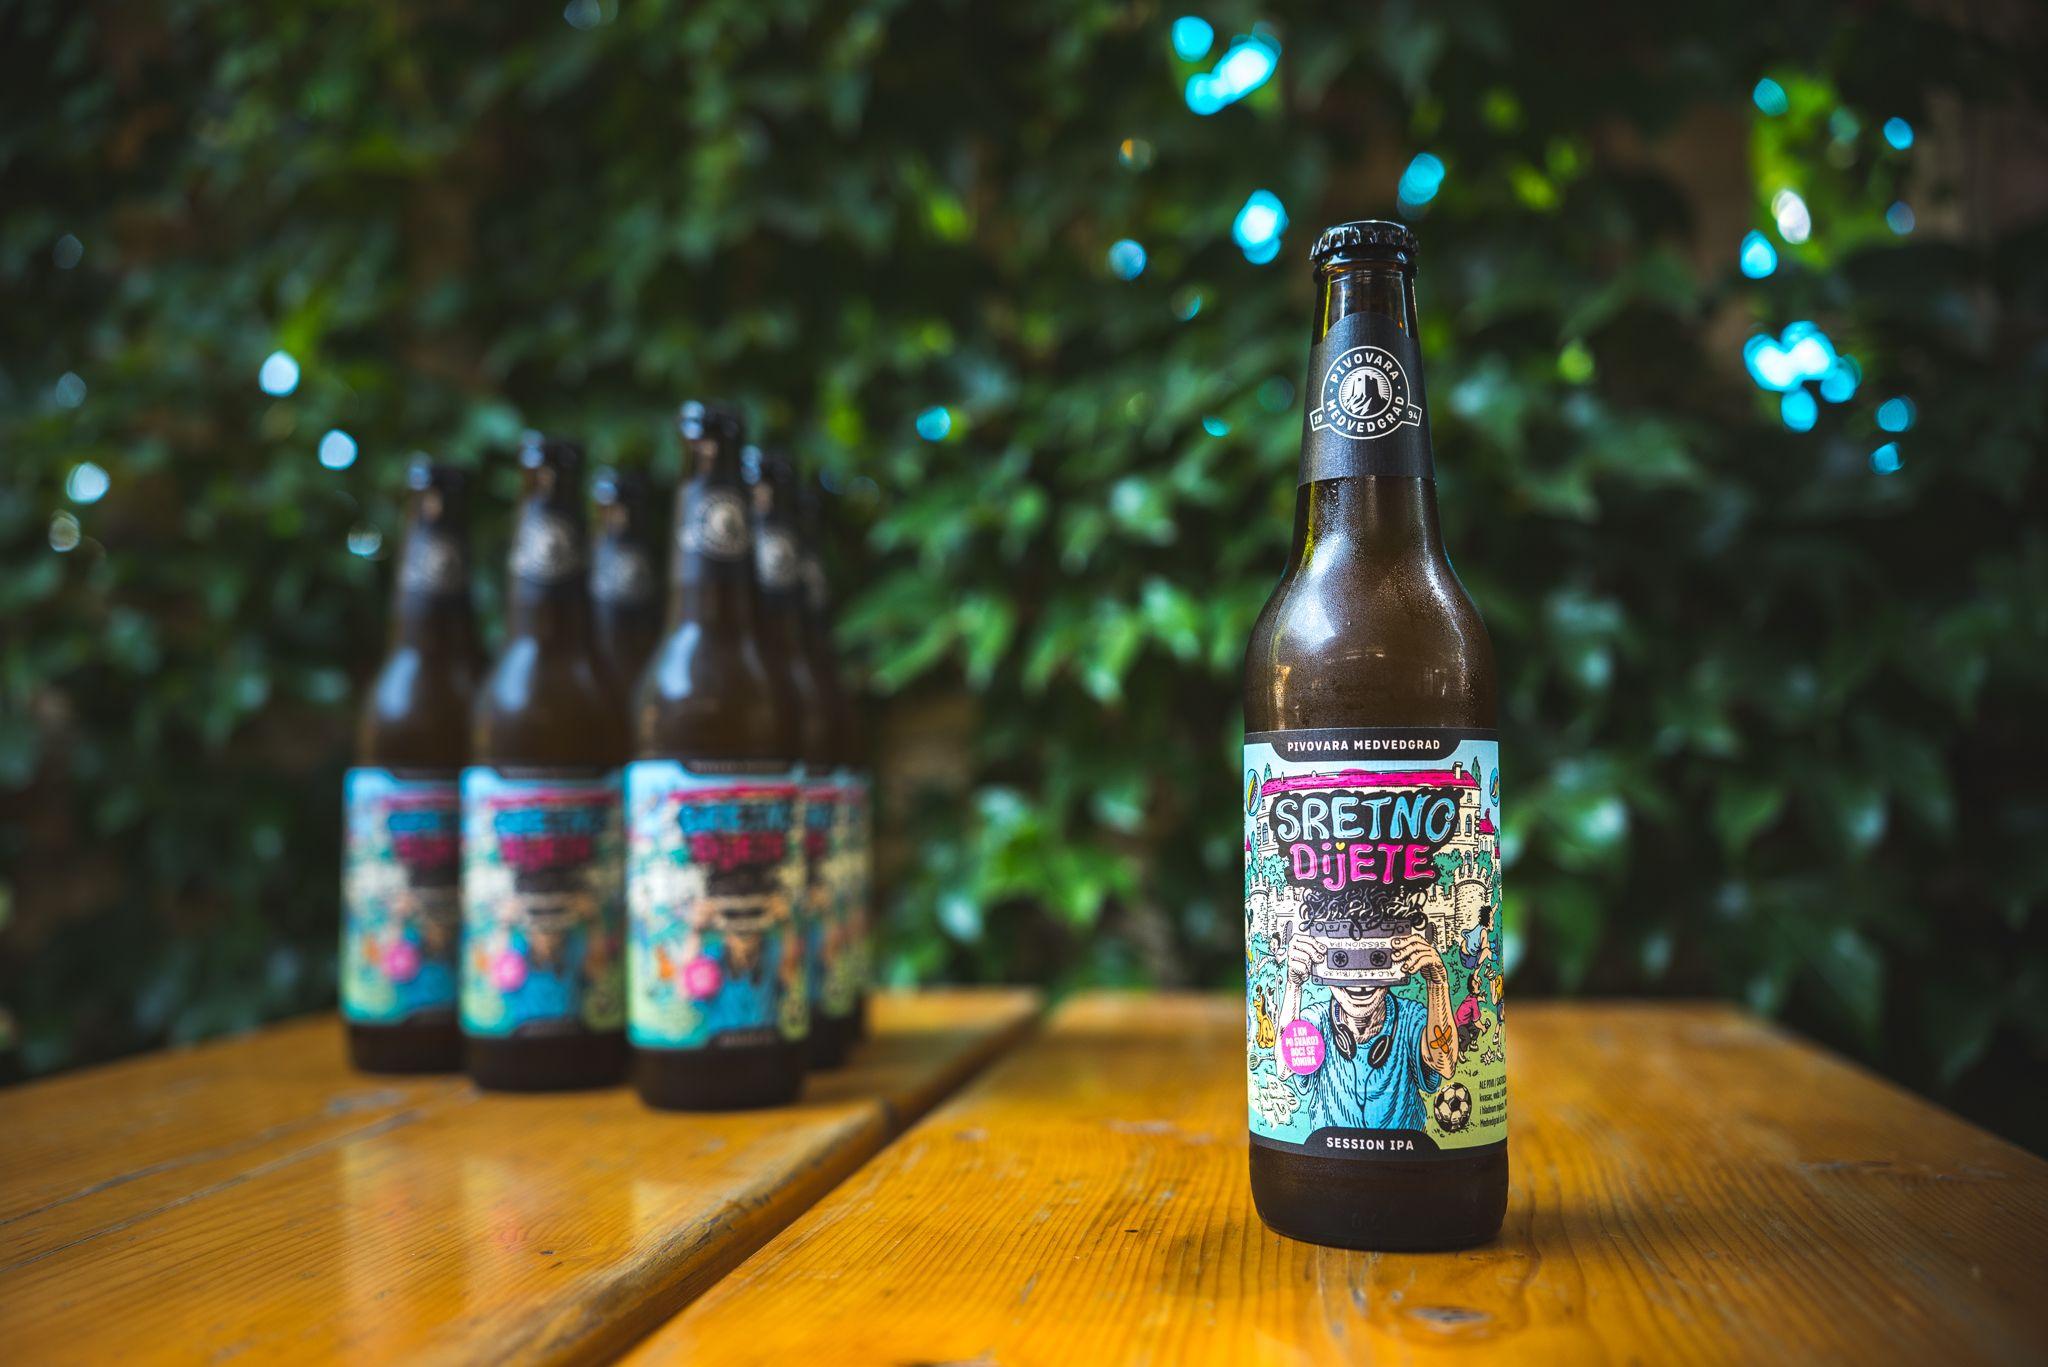 Udruga Kolibrići leti na krilima Medvedgradovog piva Sretno dijete